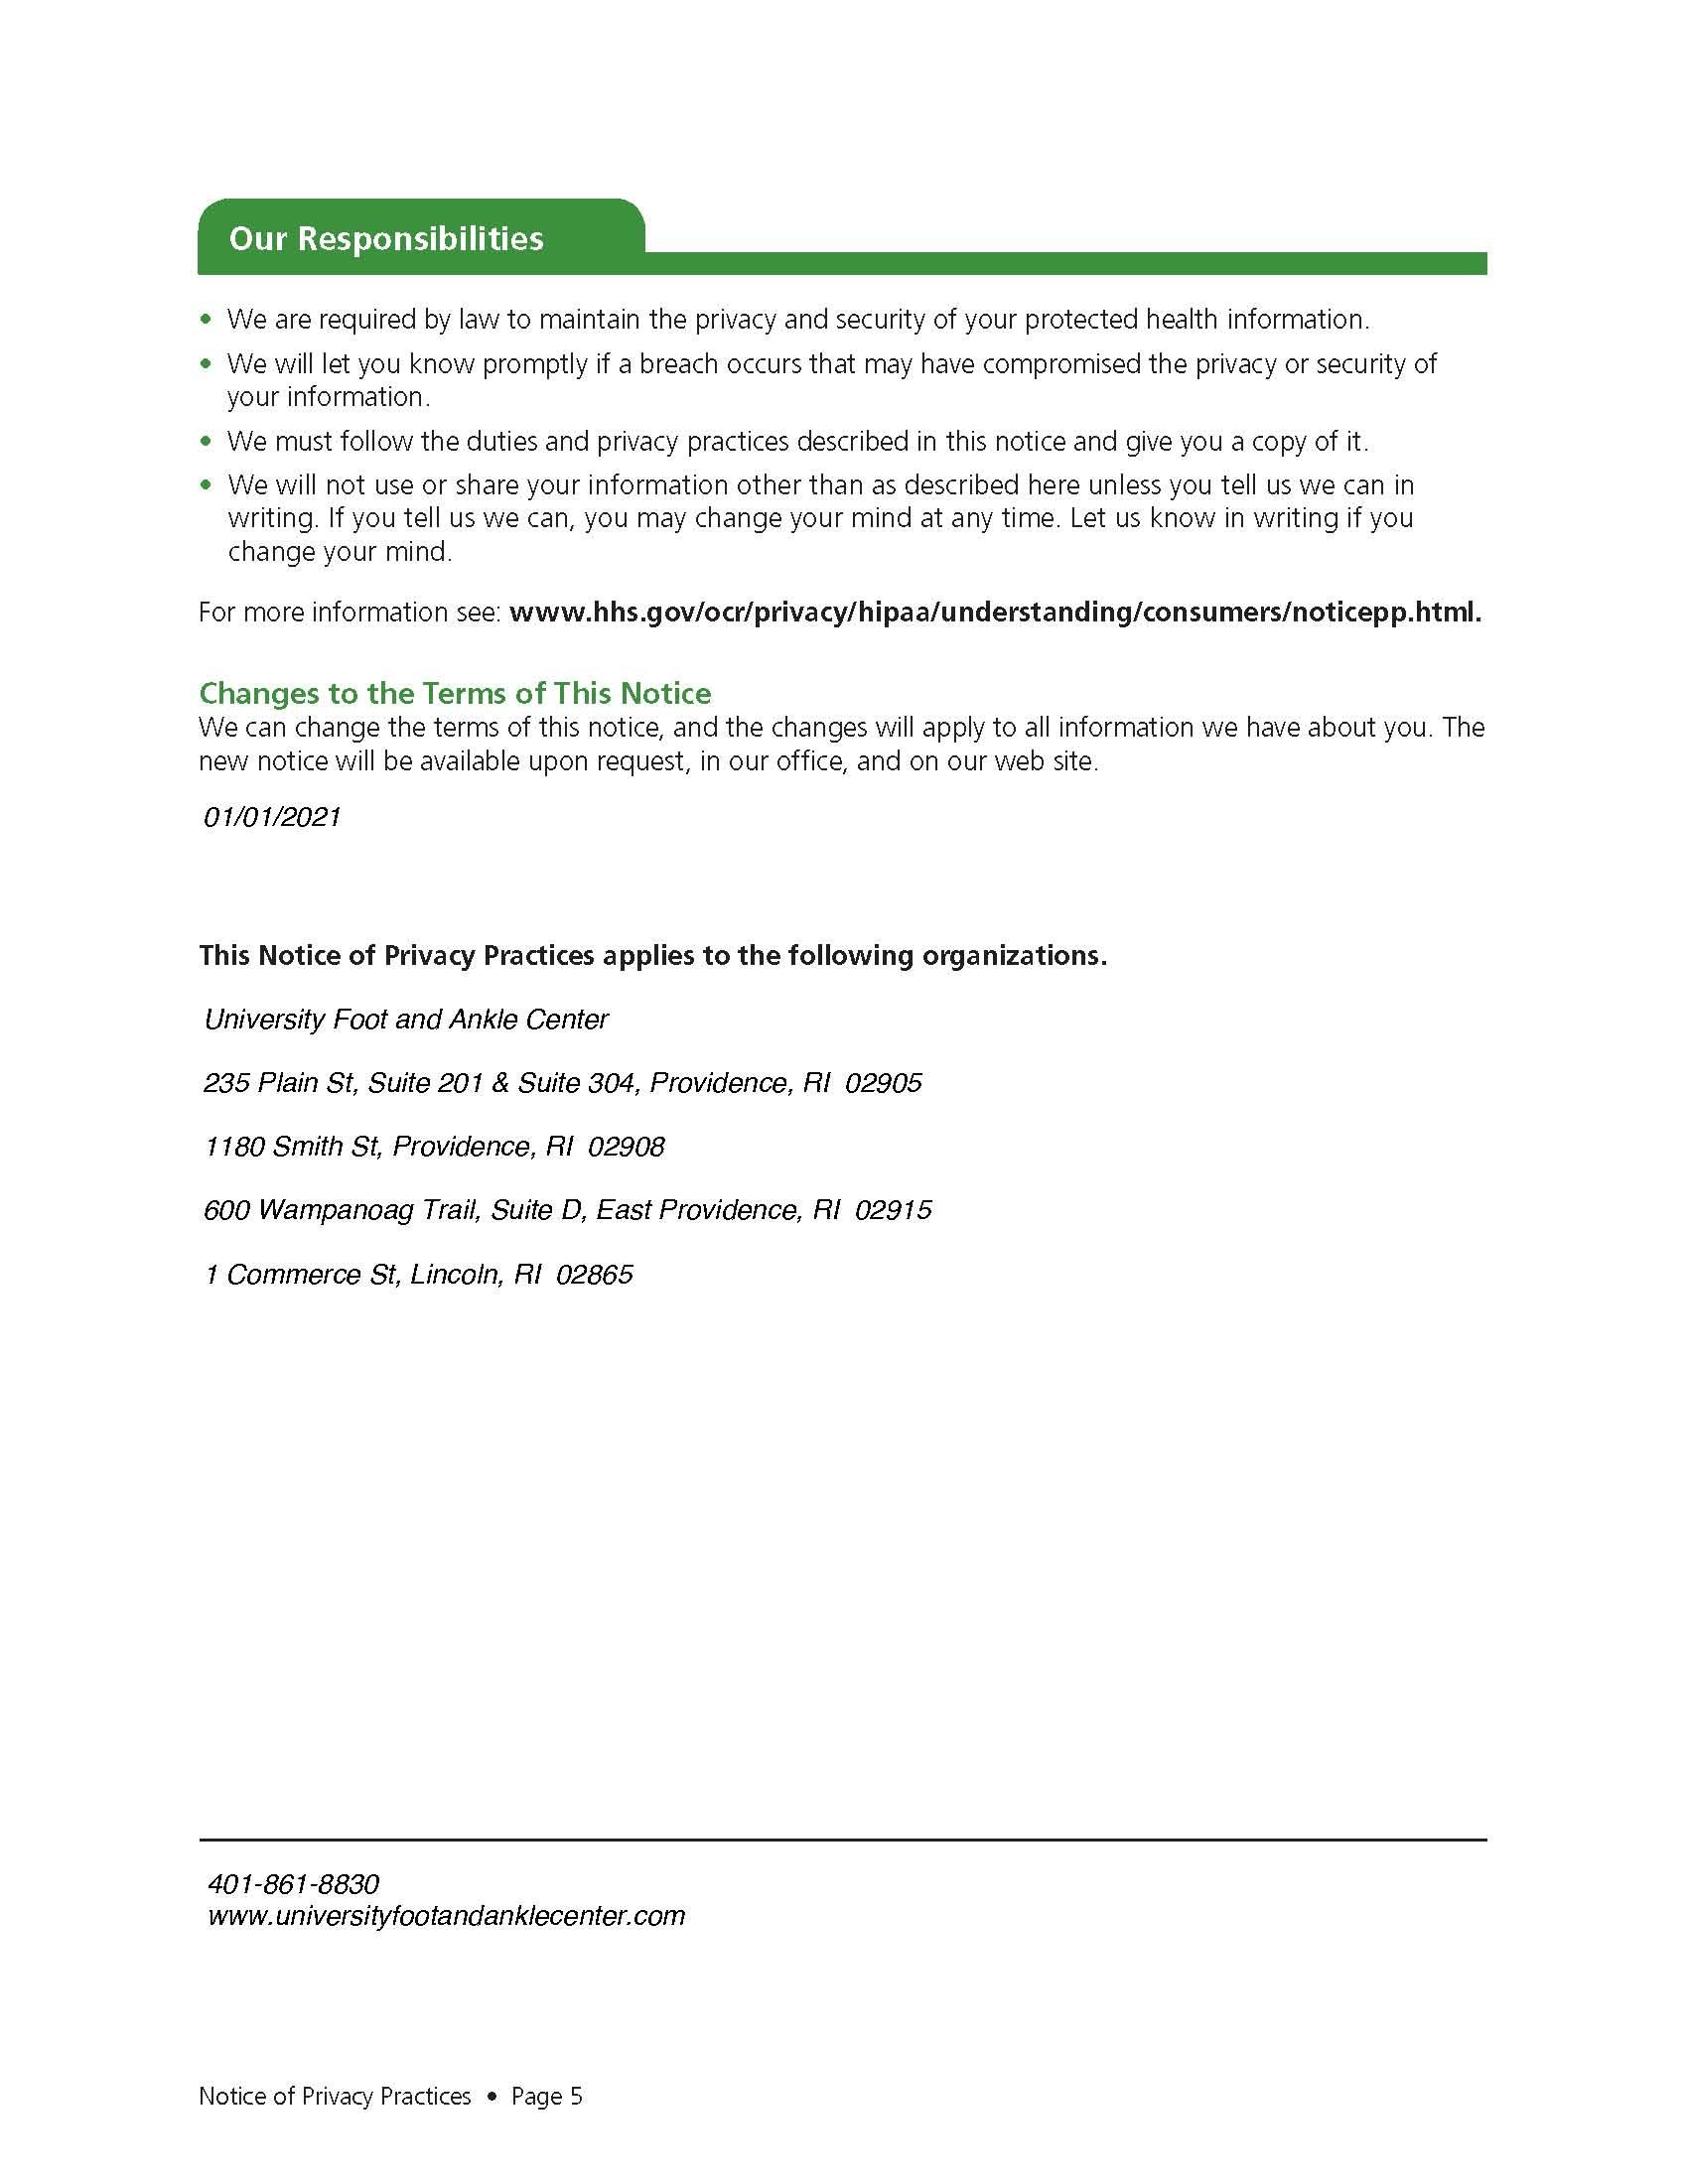 UFAAC HIPAA Doc pg 5